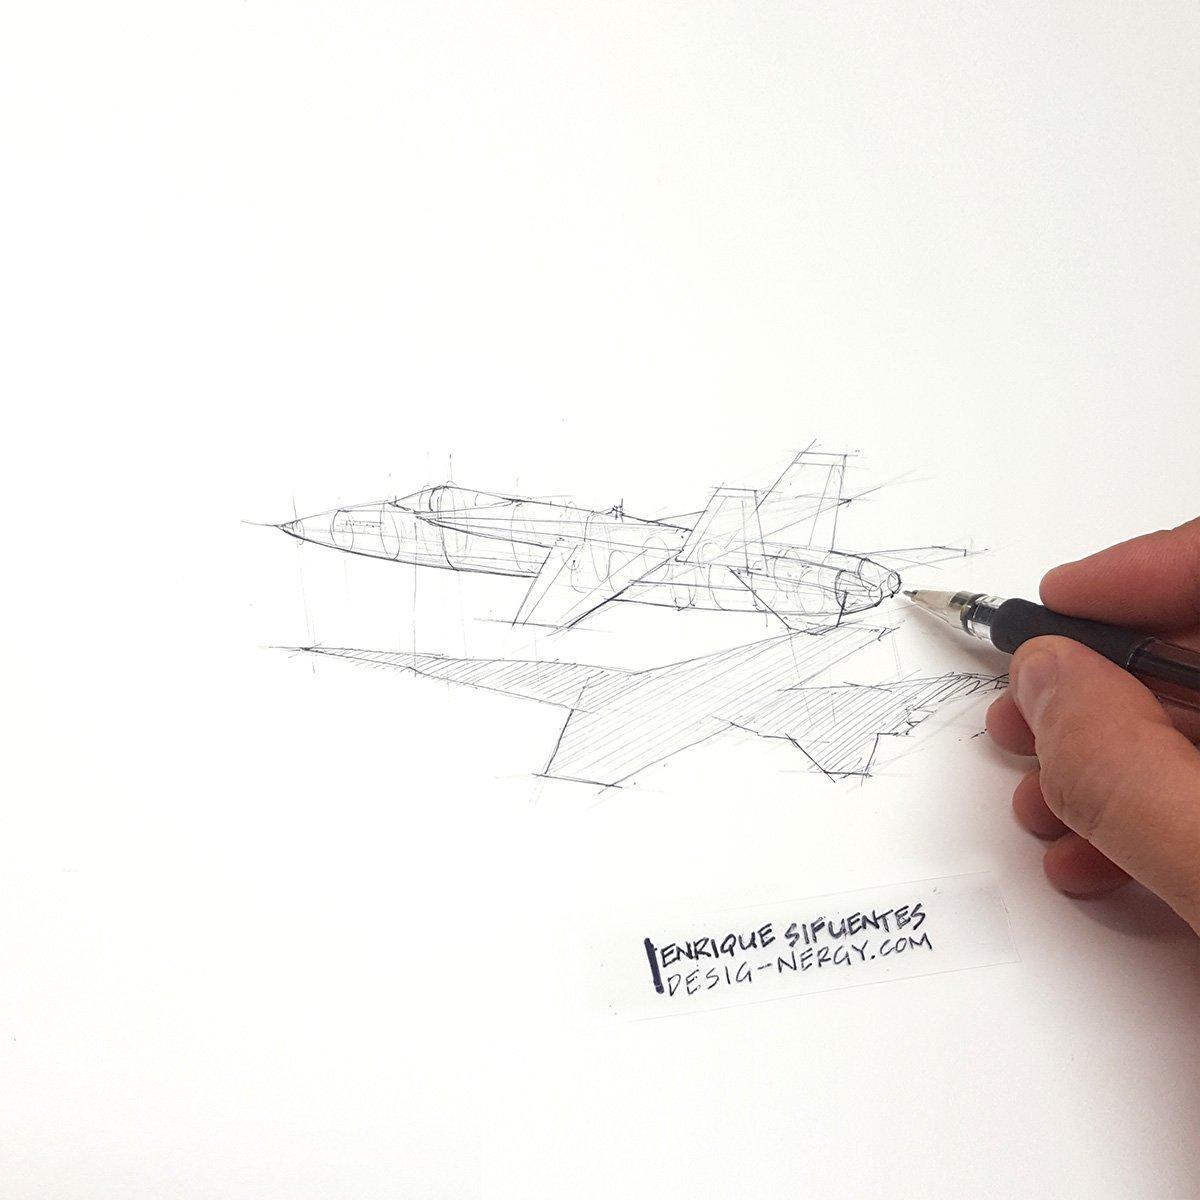 1200x1200 Enrique Sifuentes On Twitter F18 Hornet Quick Thumbnail